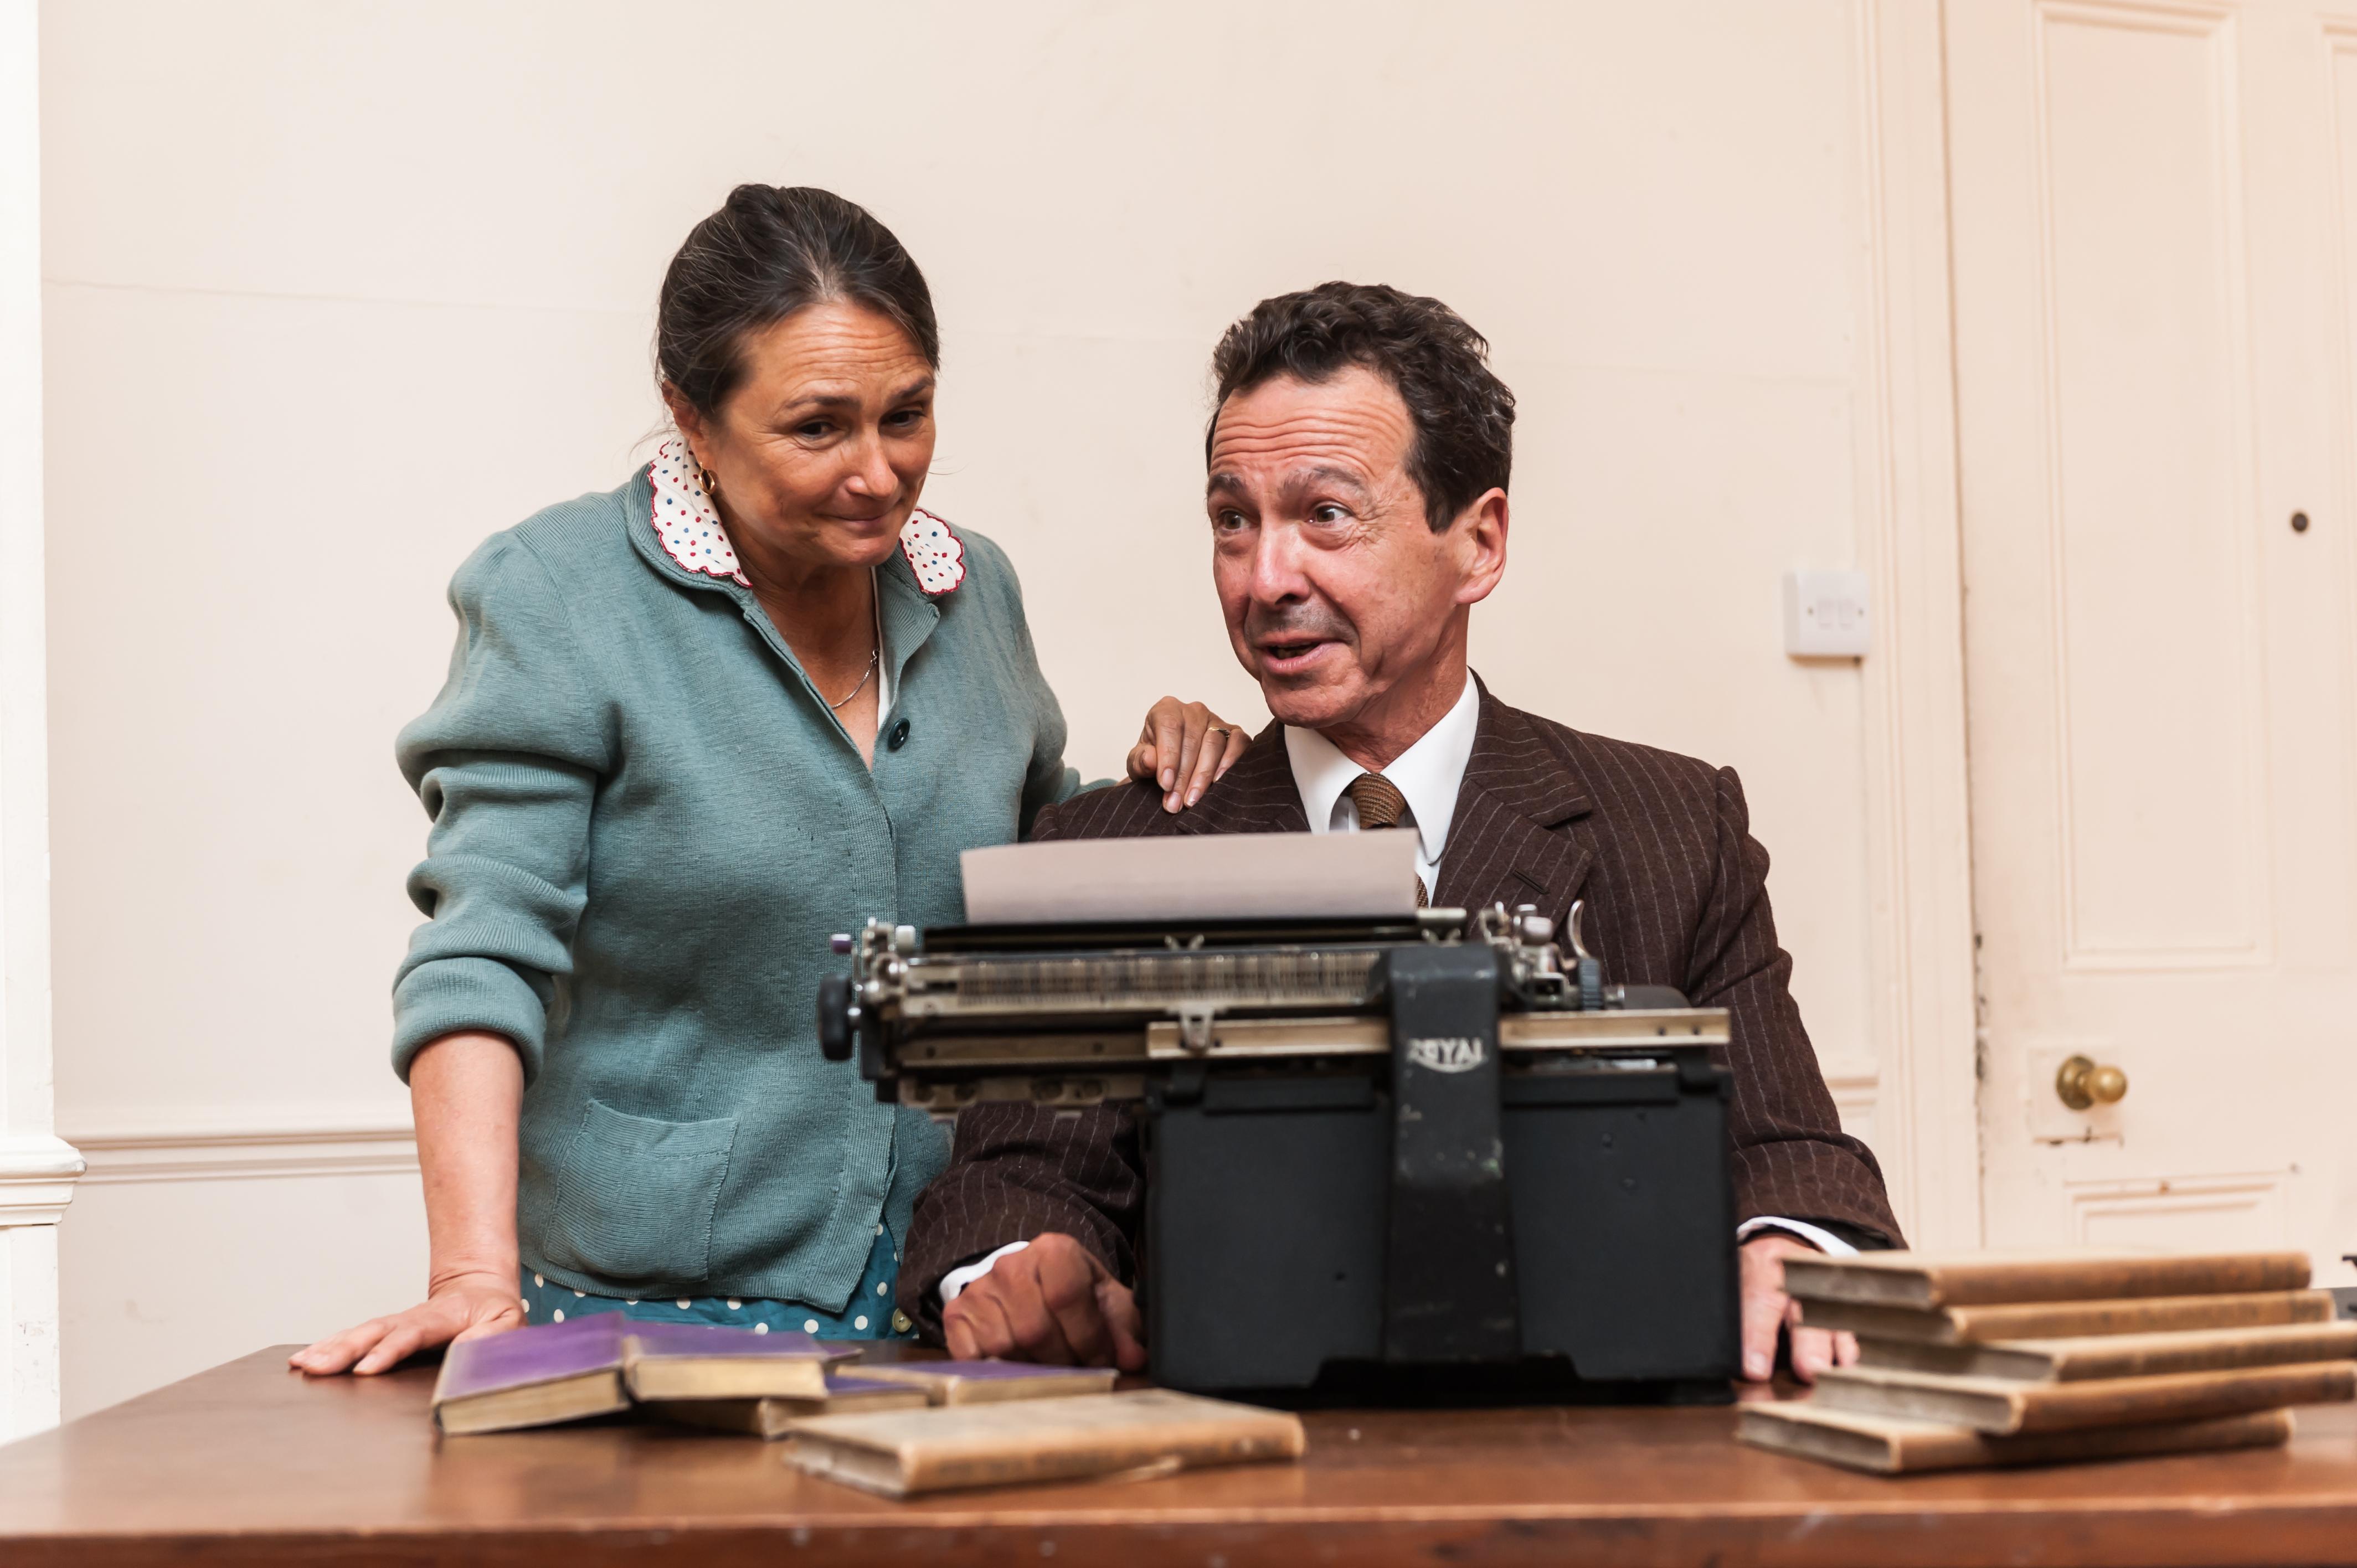 BWW Review: MR GILLIE, Finborough Theatre